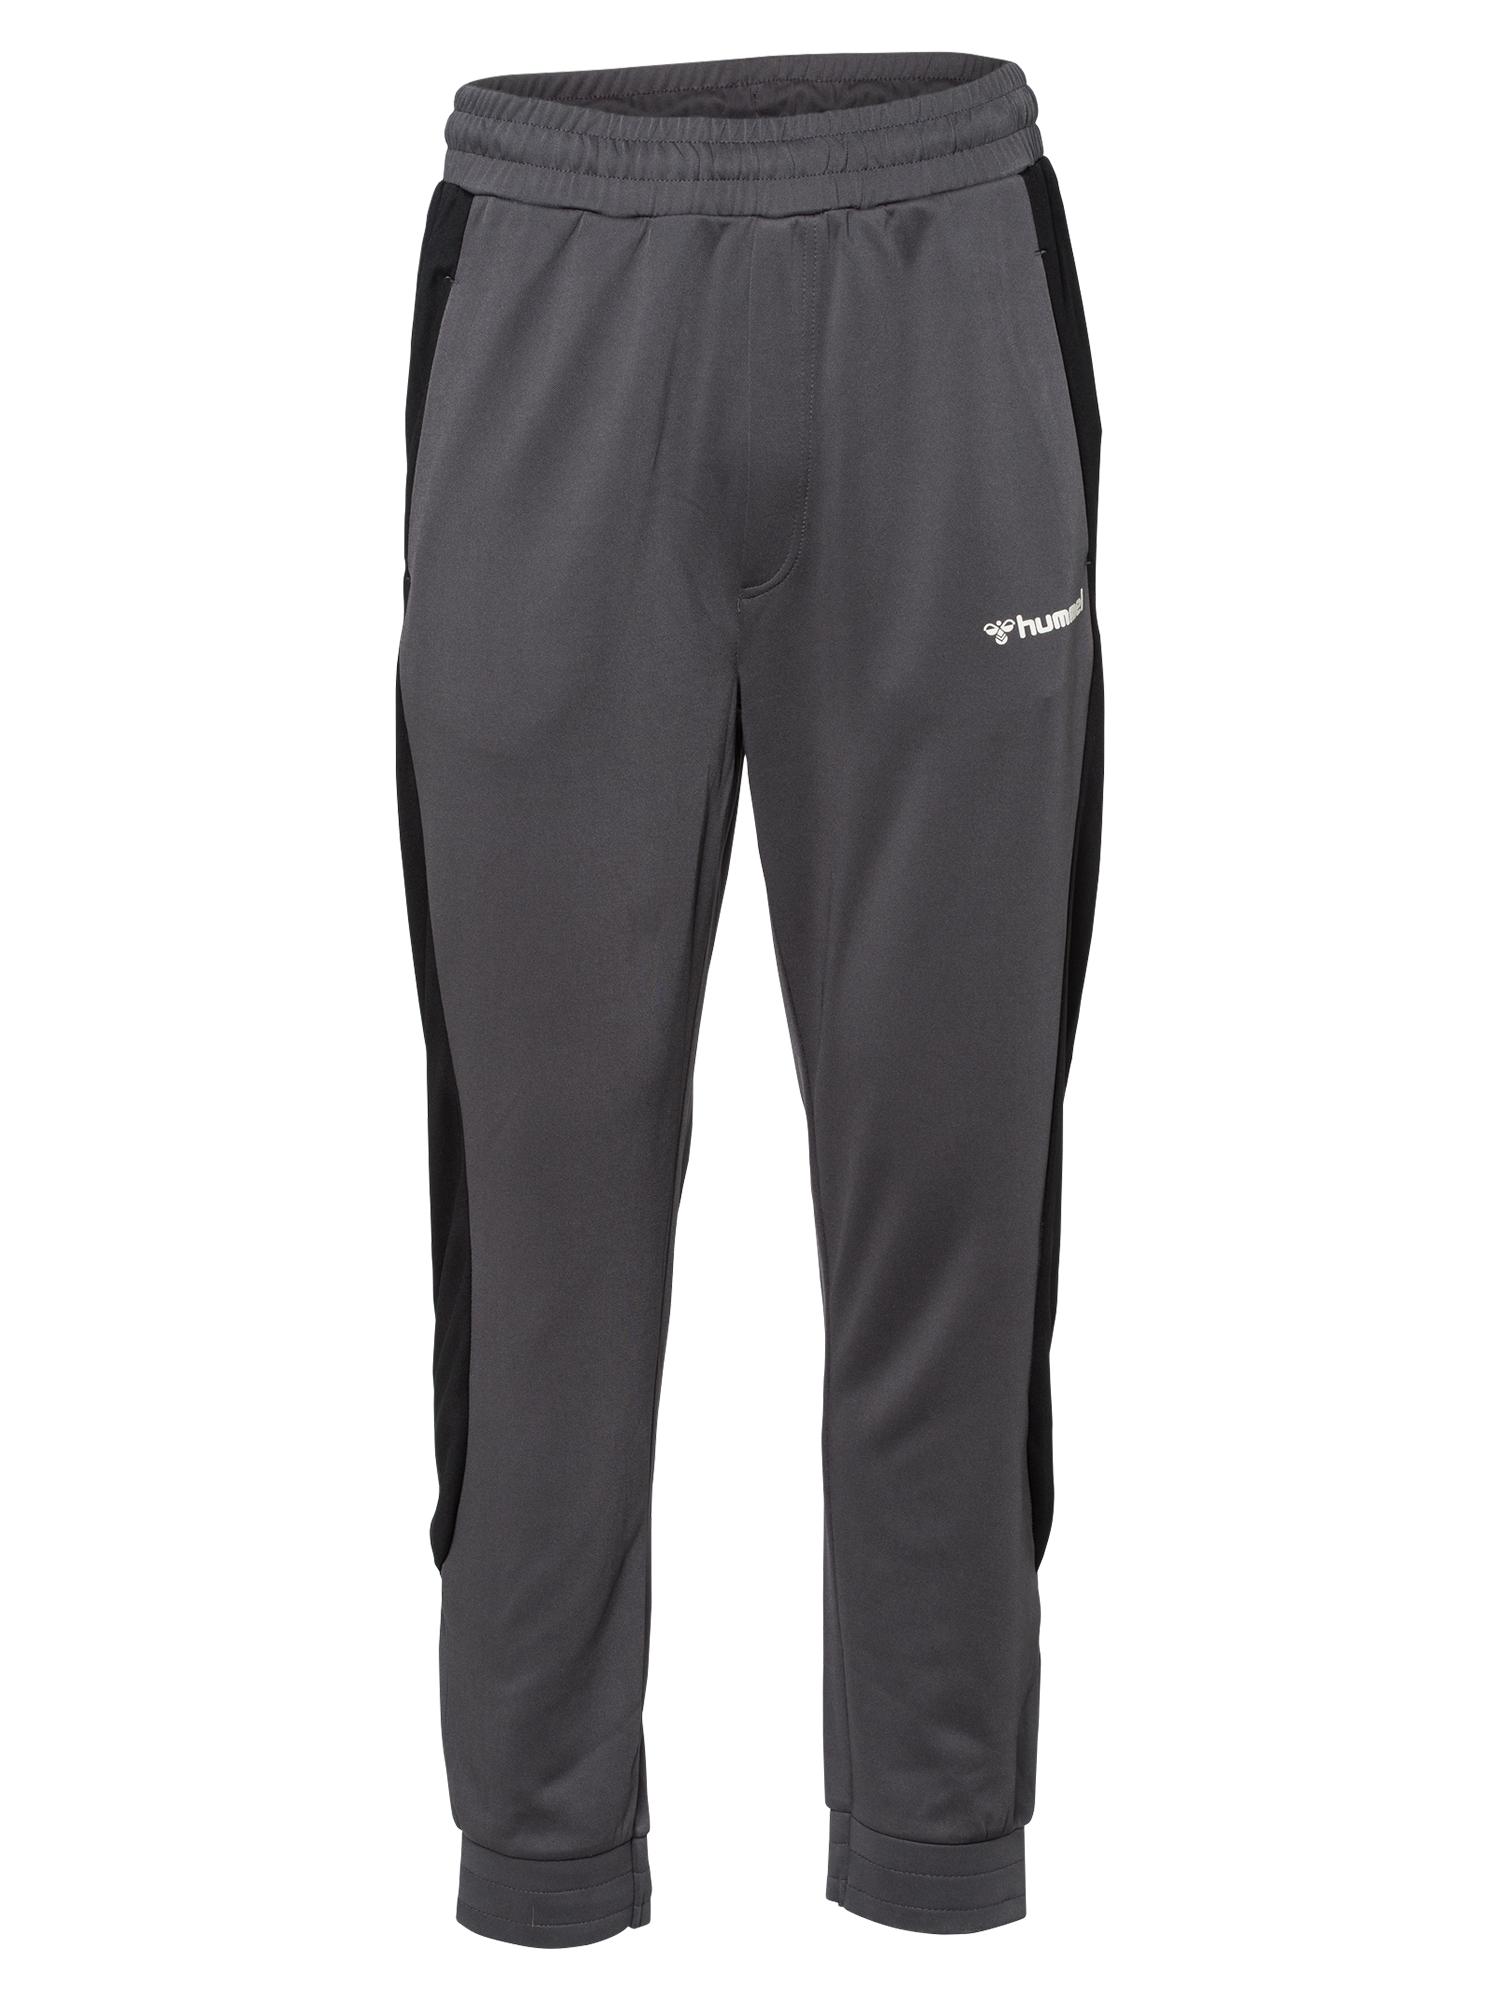 Hummel Sportinės kelnės pilka / juoda / balta